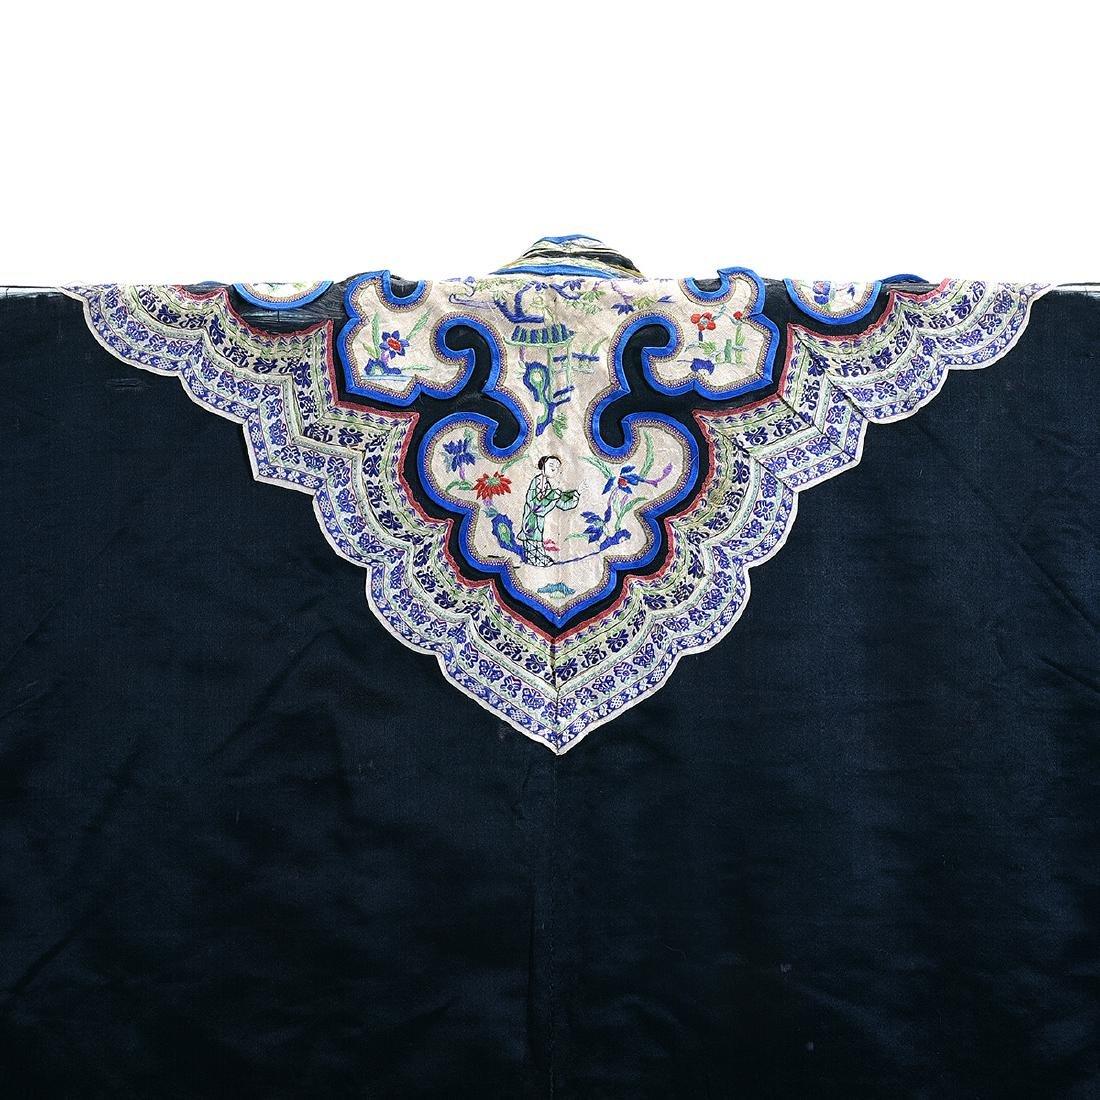 Embroidered Silk Black Ground Lady's Robe - 6